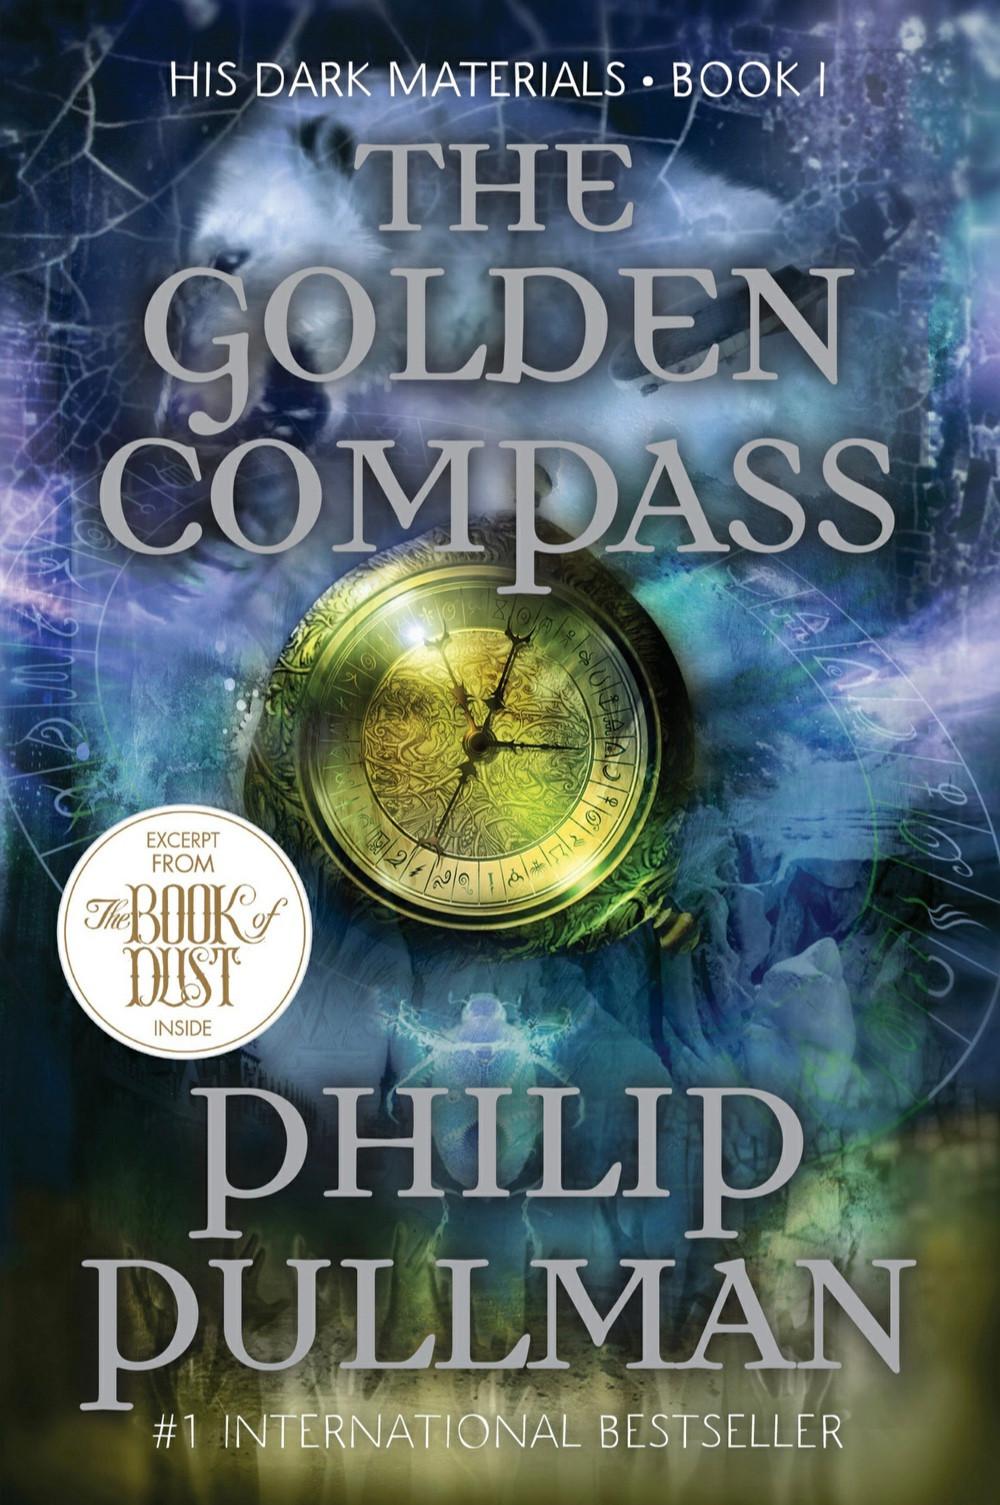 The Golden Compass, His Dark Materials, Philip Pullman, Lyra